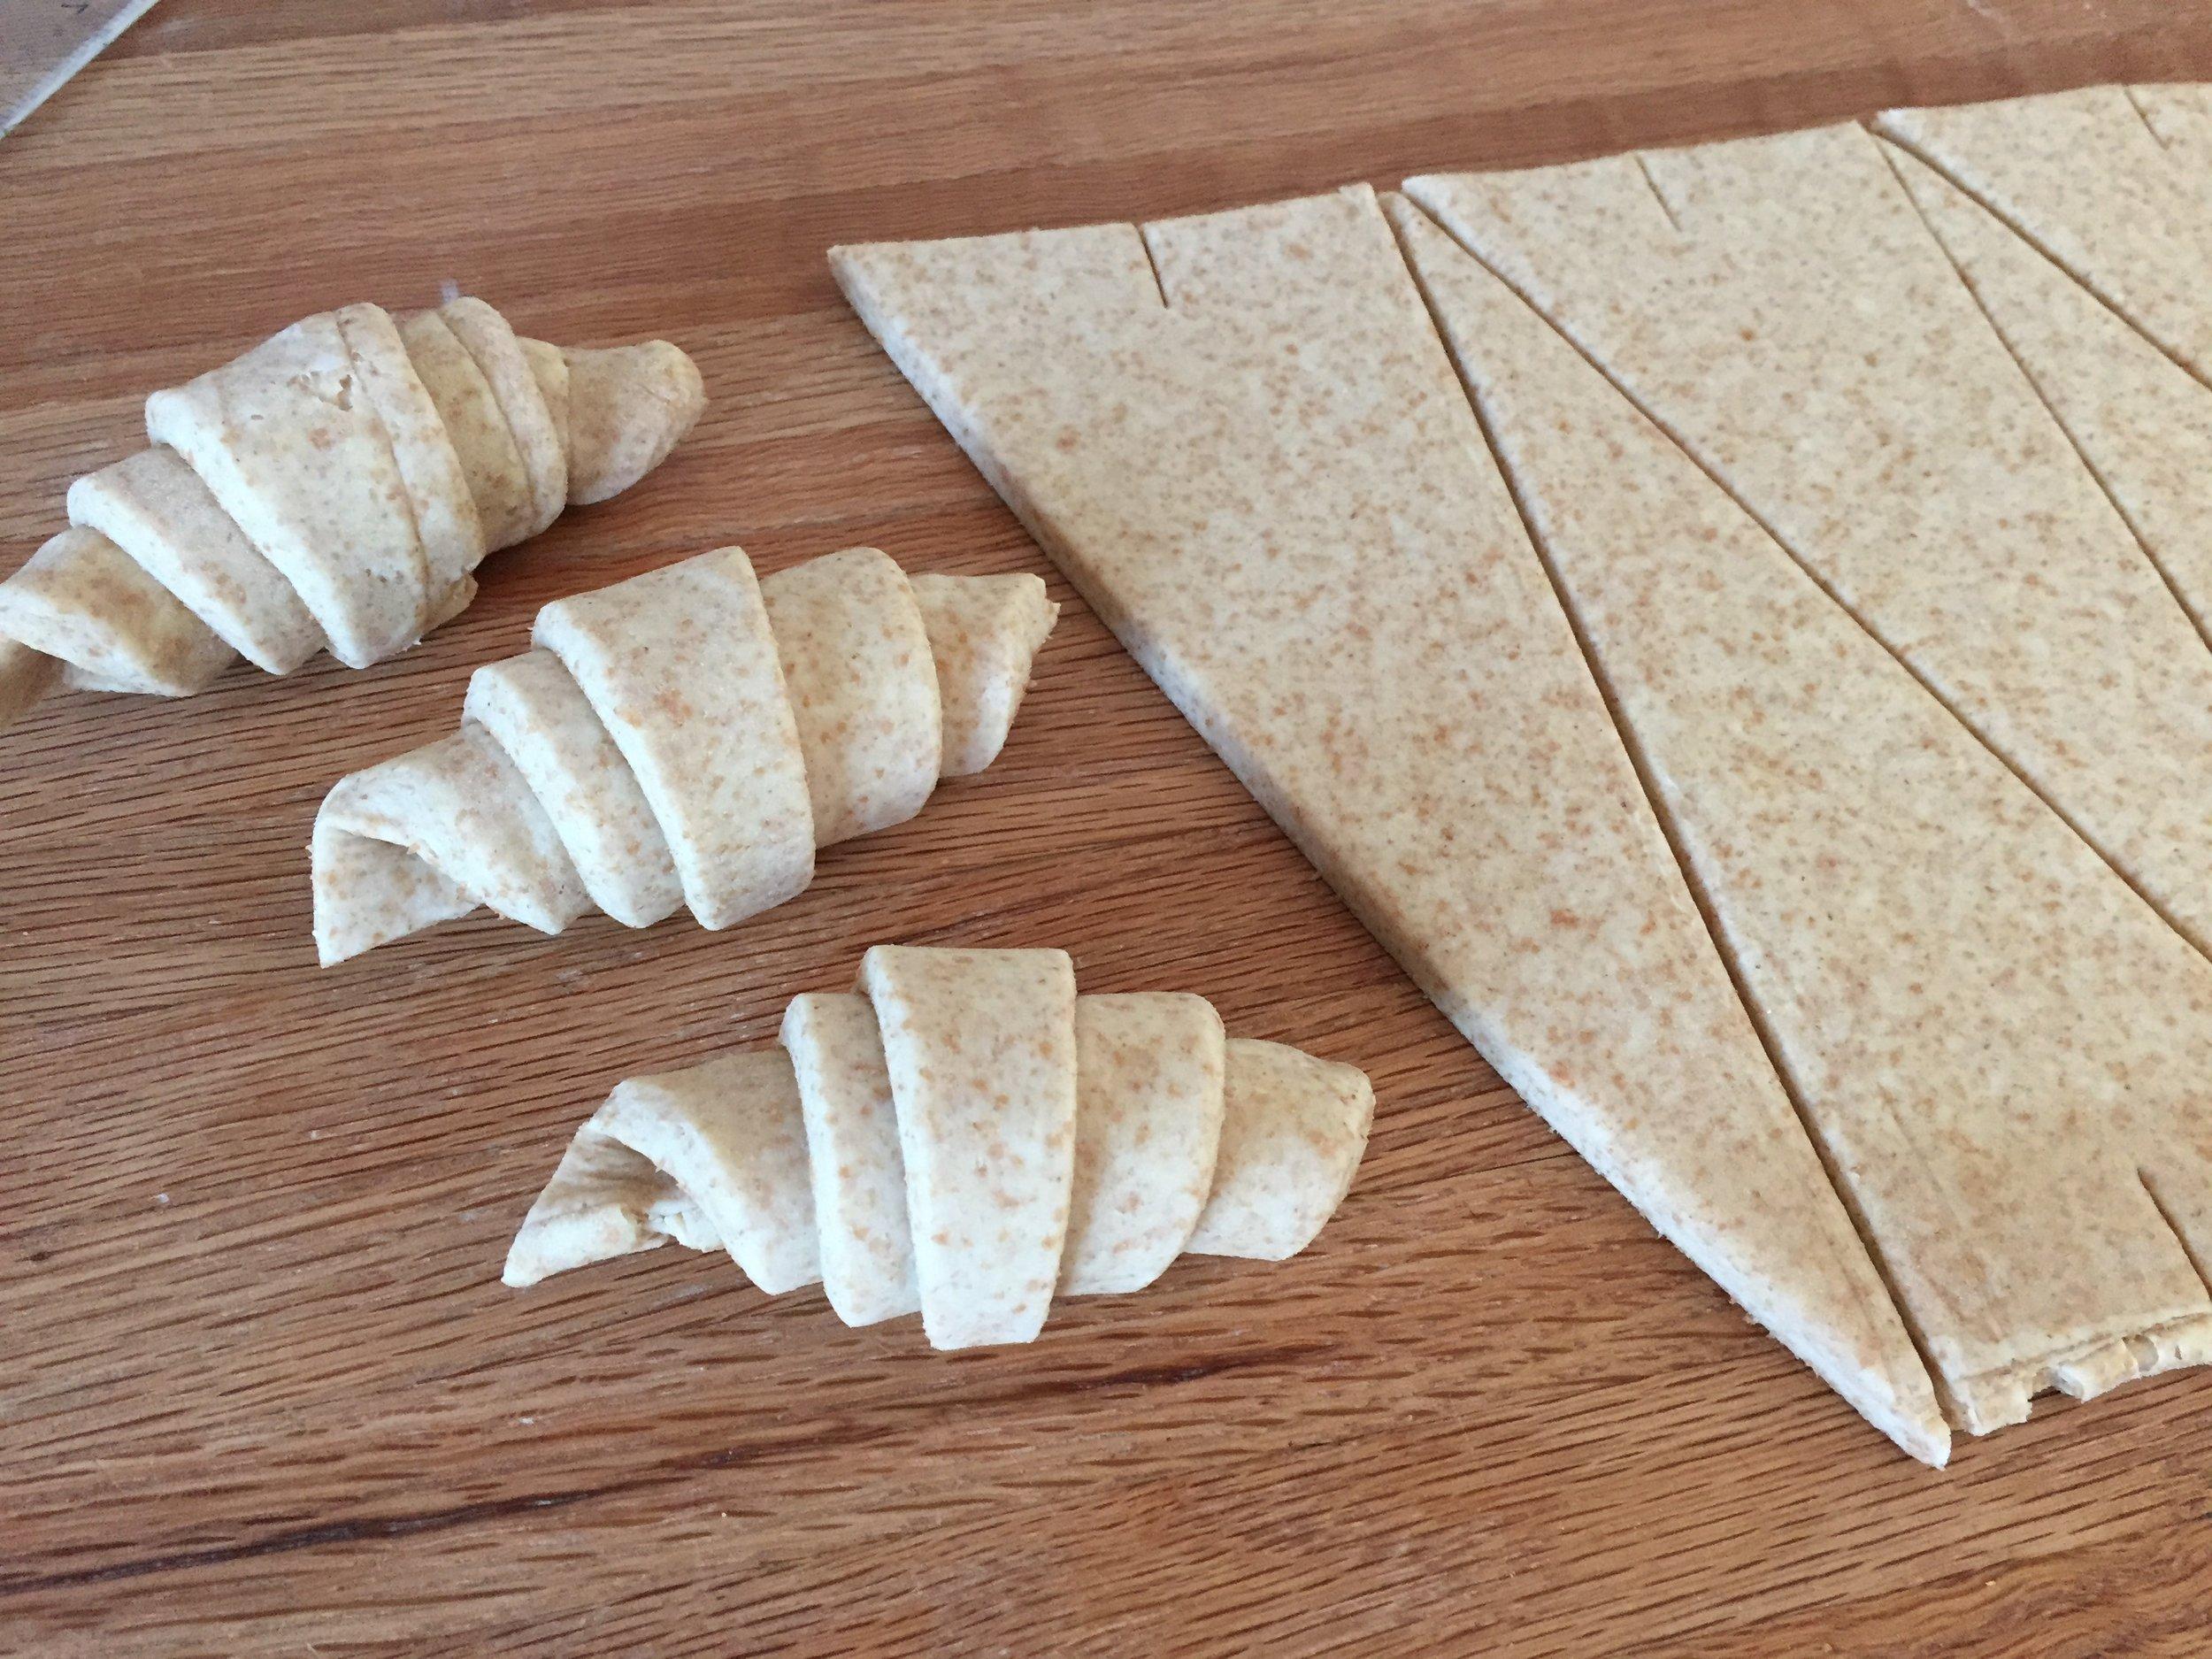 Shaping the spelt croissants